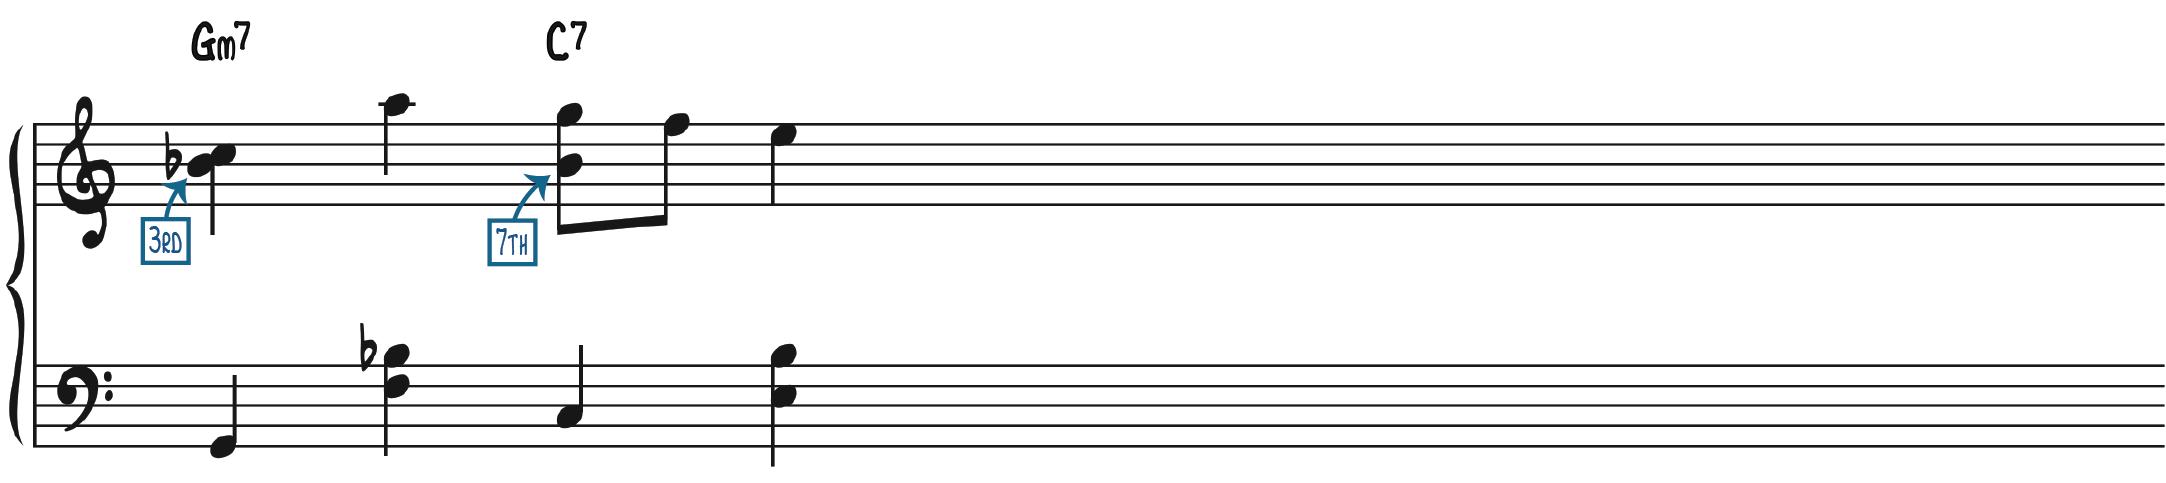 Melodic Harmonization using 3rd & 7th